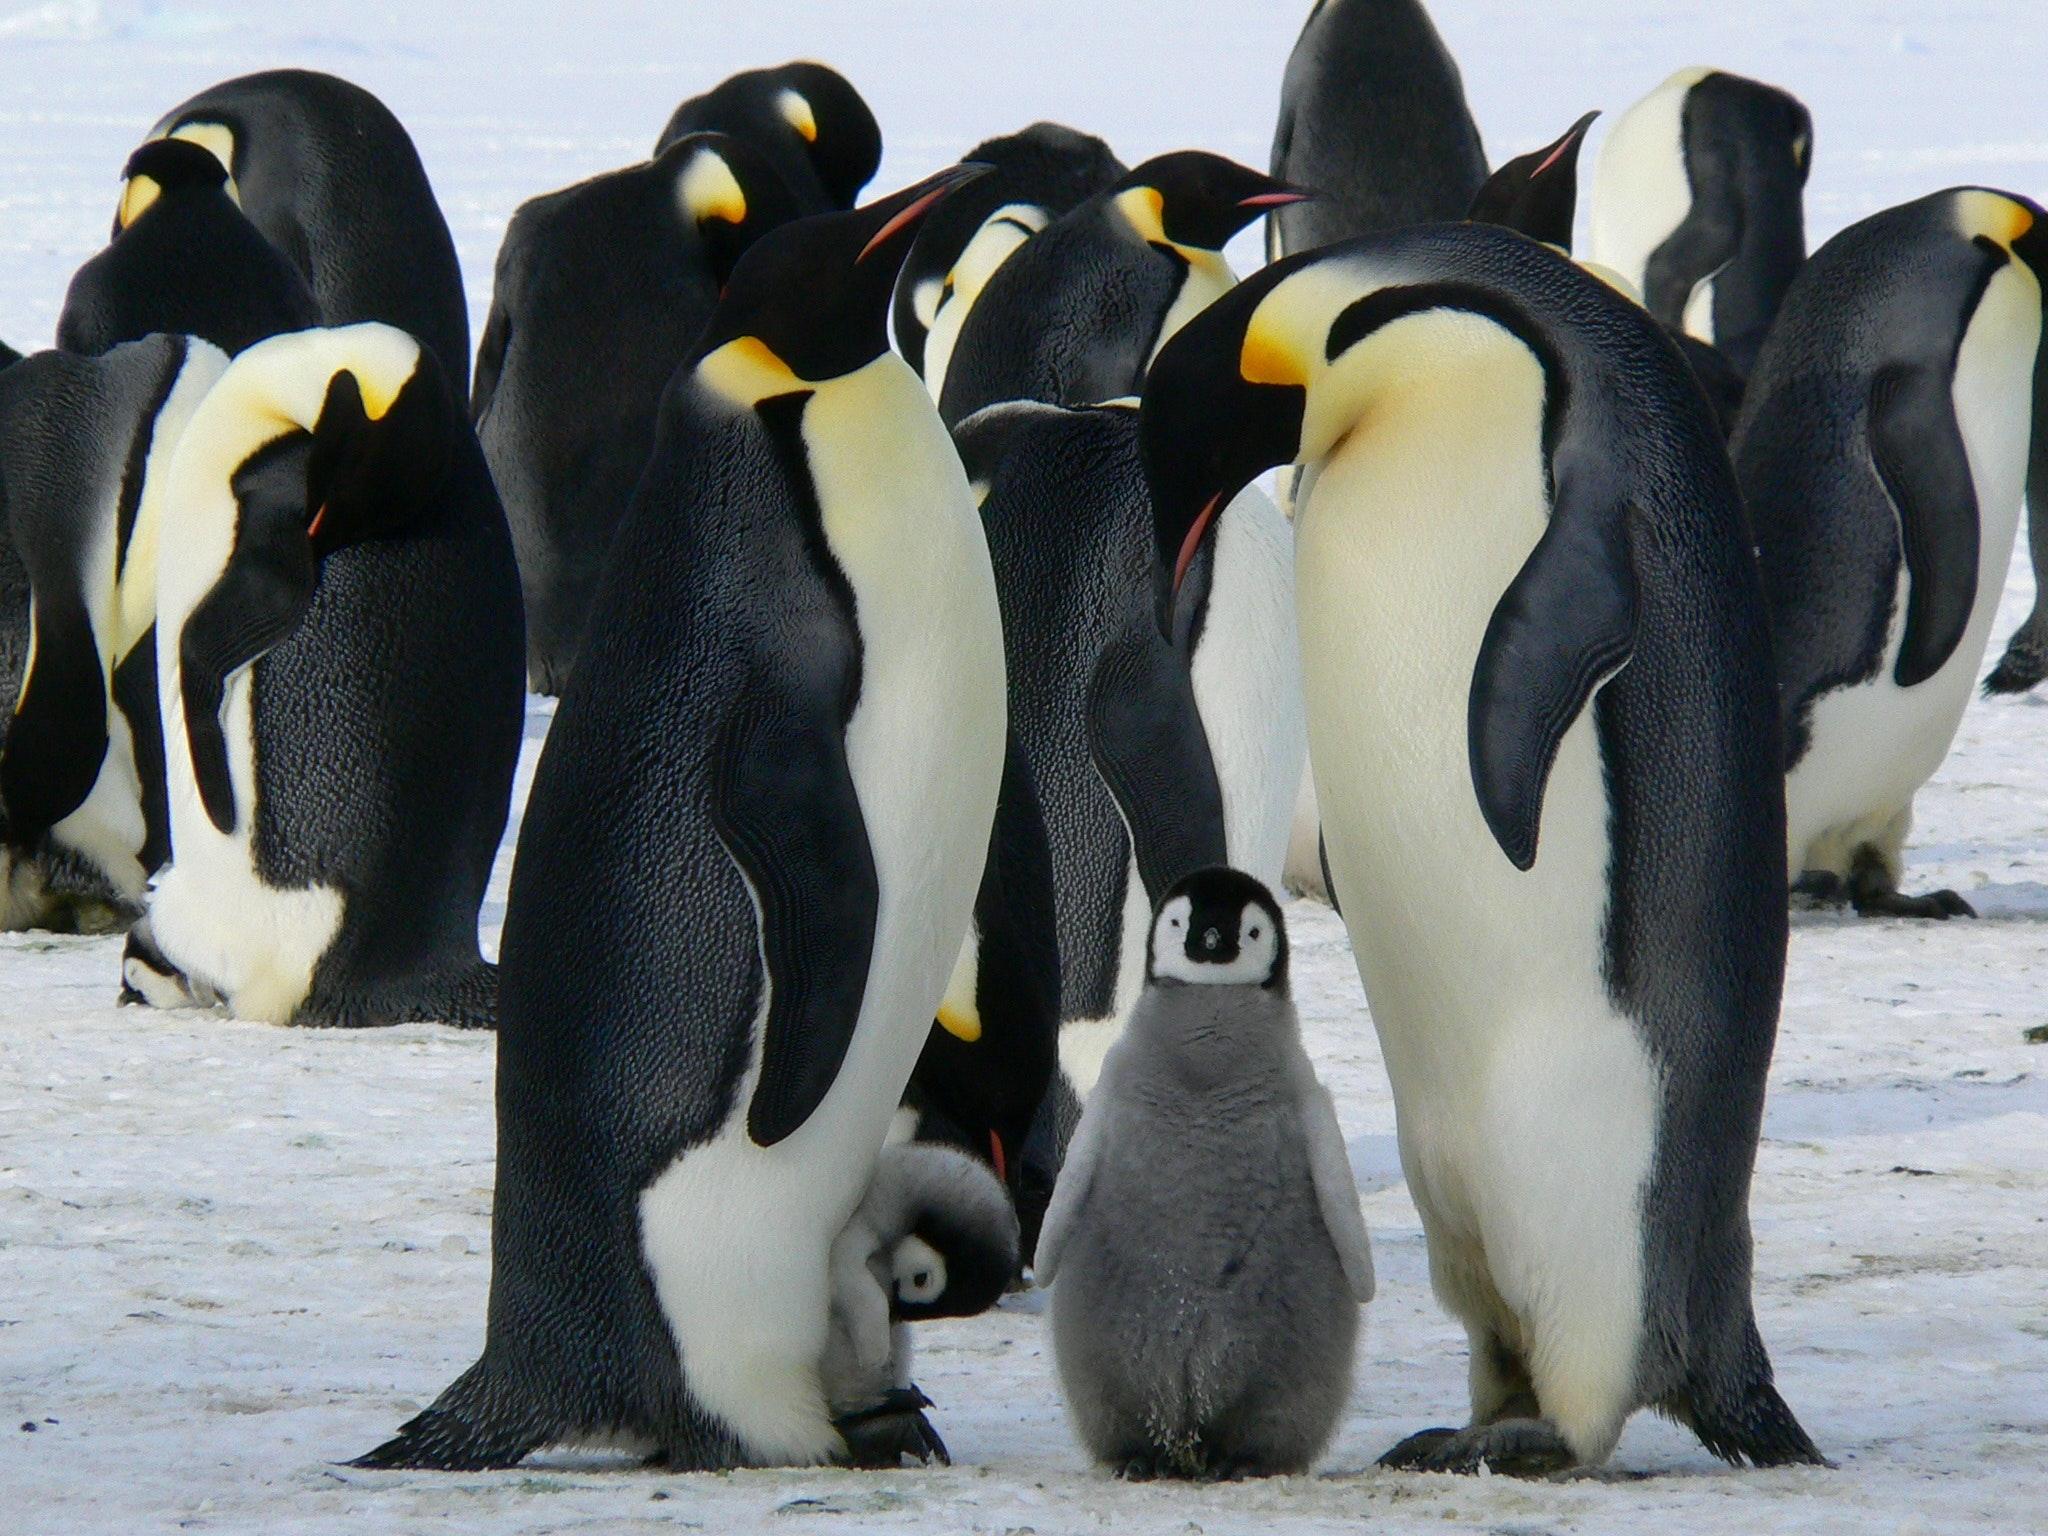 animals-birds-cold-52509.jpg